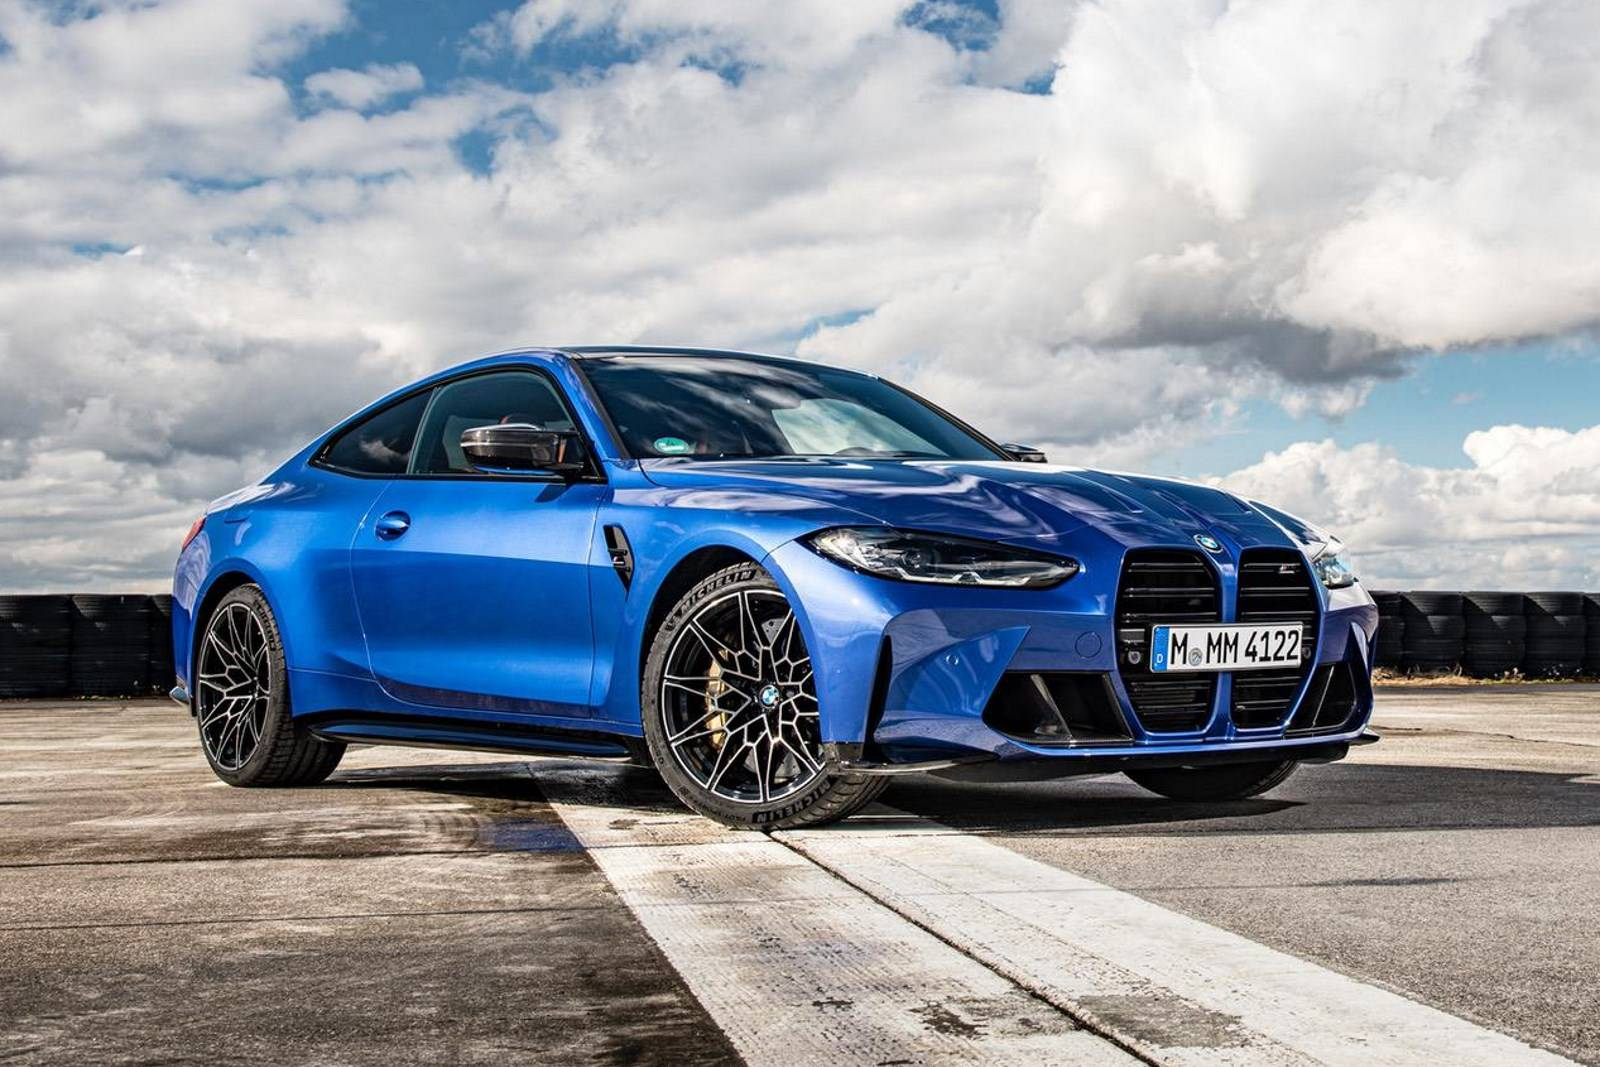 Седан BMW M3 и купе BMW M4 Competition прошли тест-драйв 2